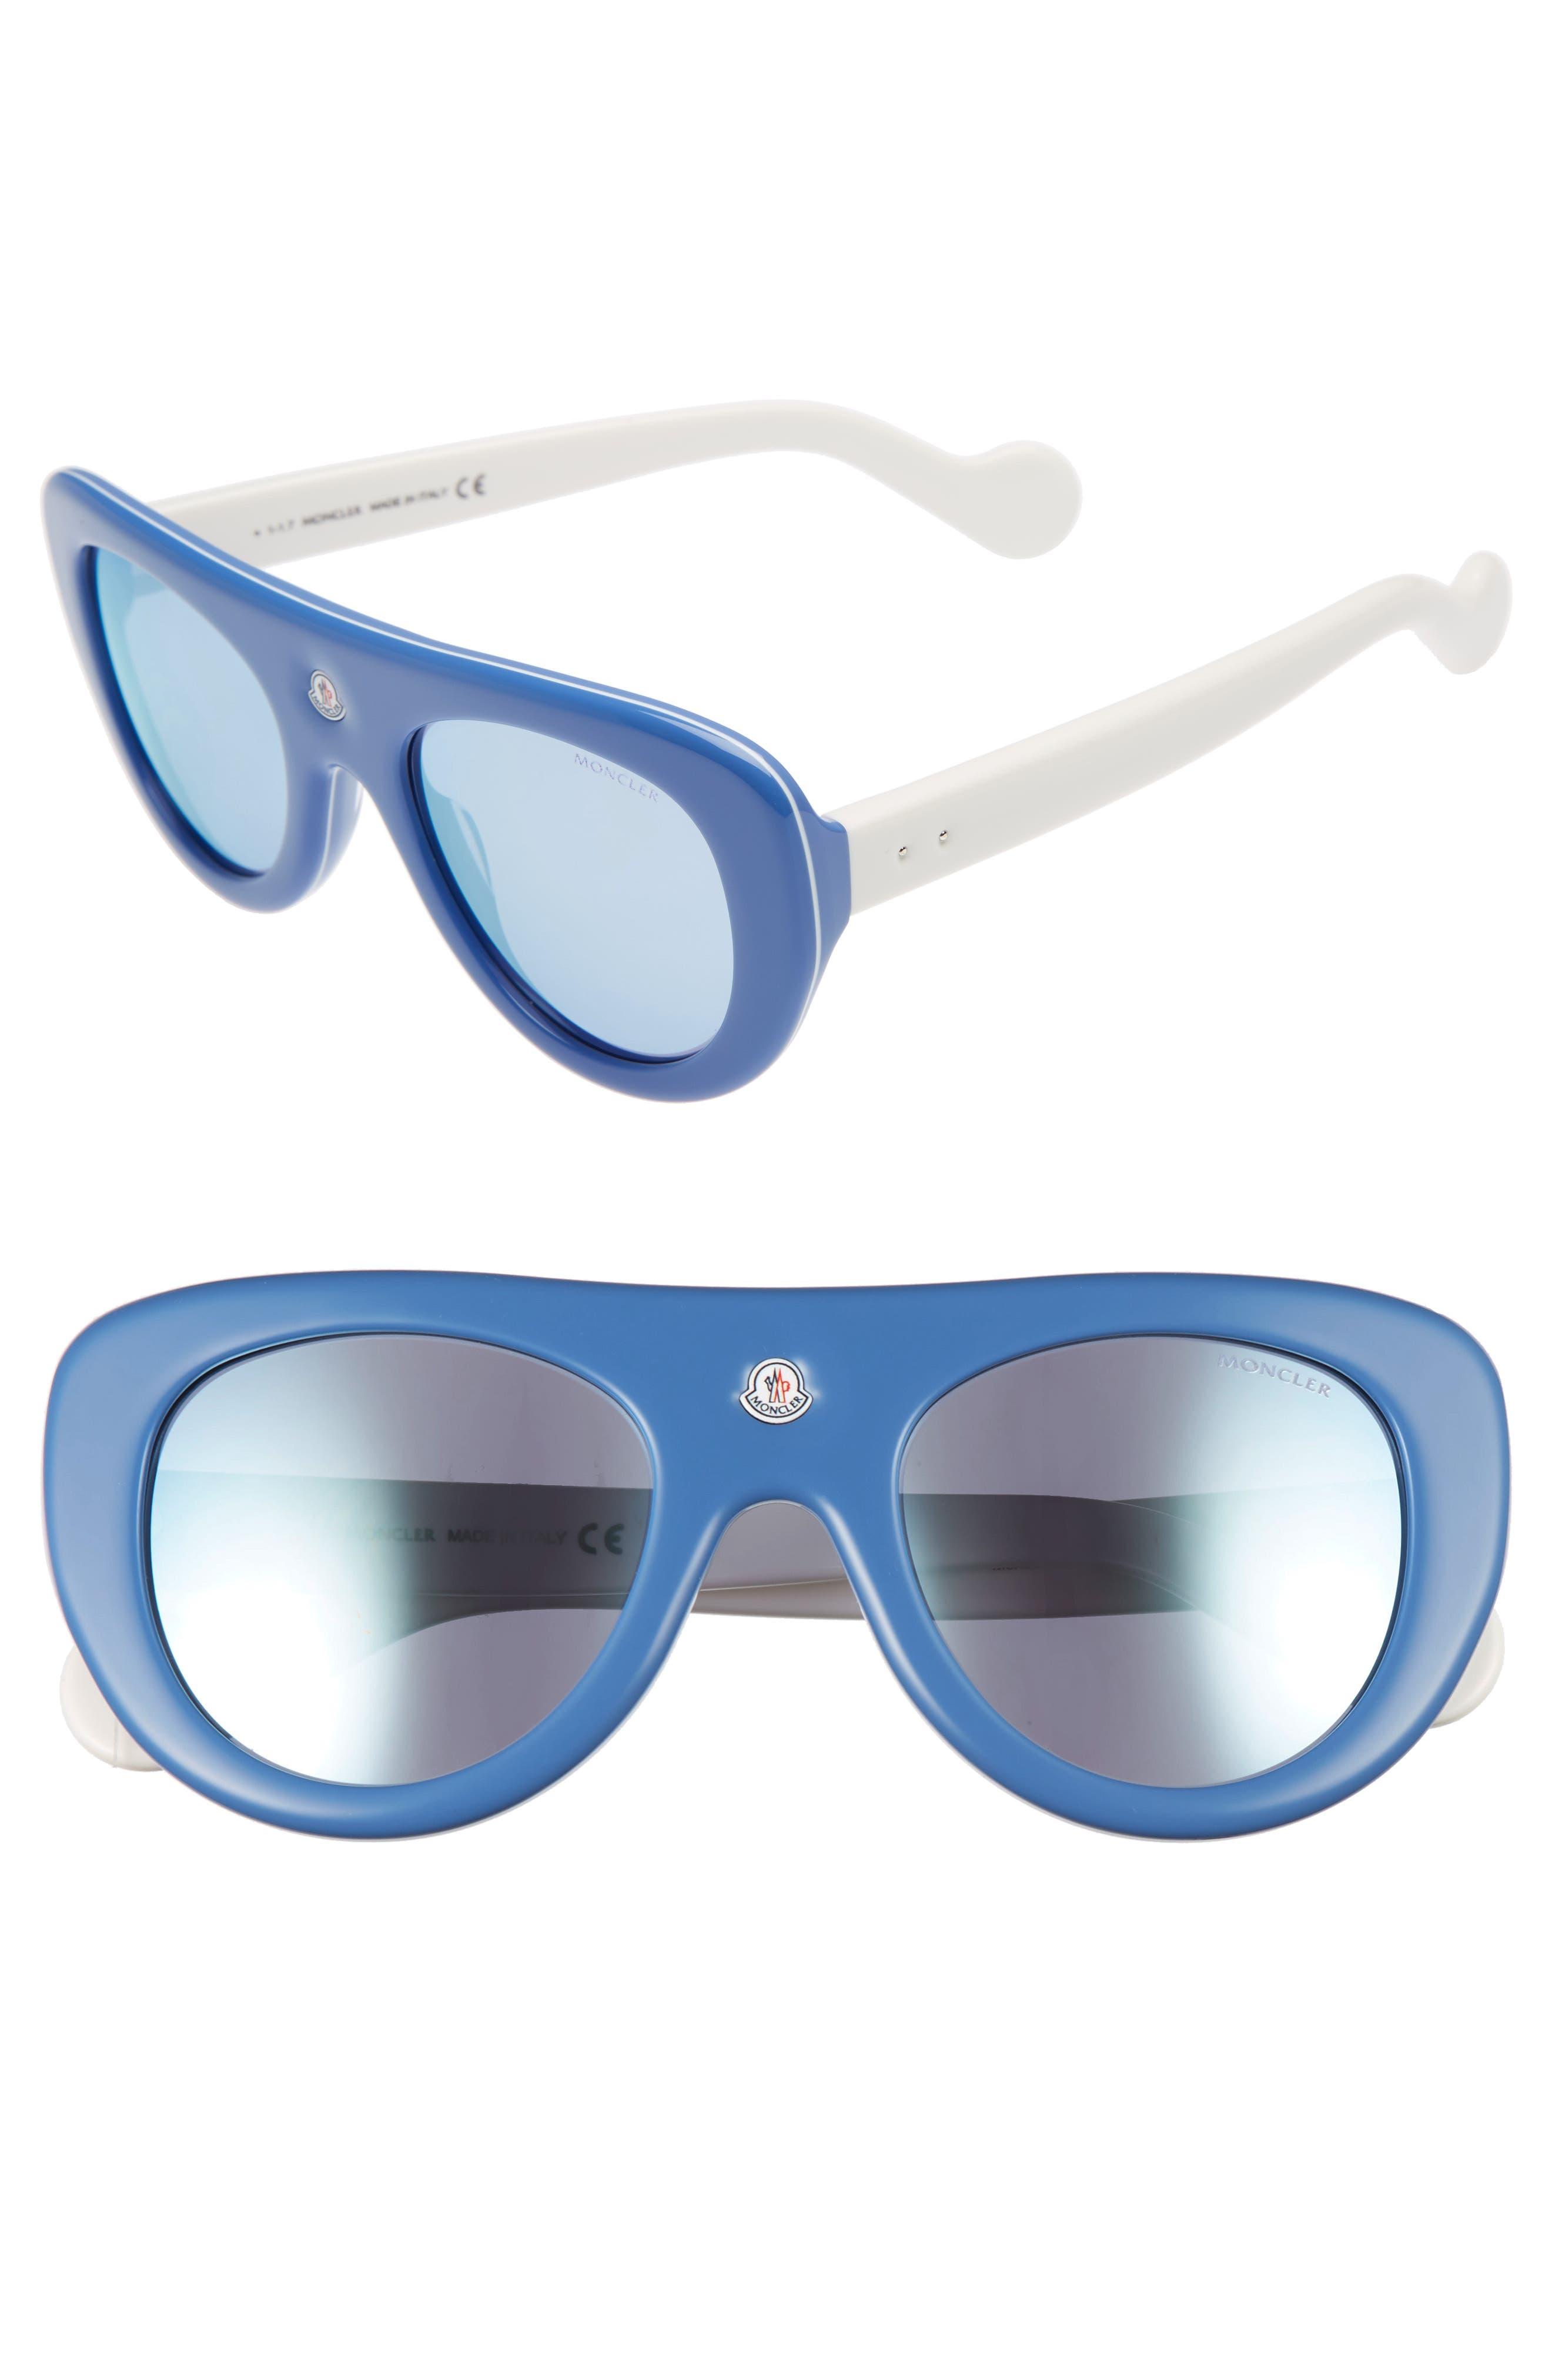 51mm Shield Sunglasses,                         Main,                         color, BLUE/ IVORY/ VIOLET MIRROR